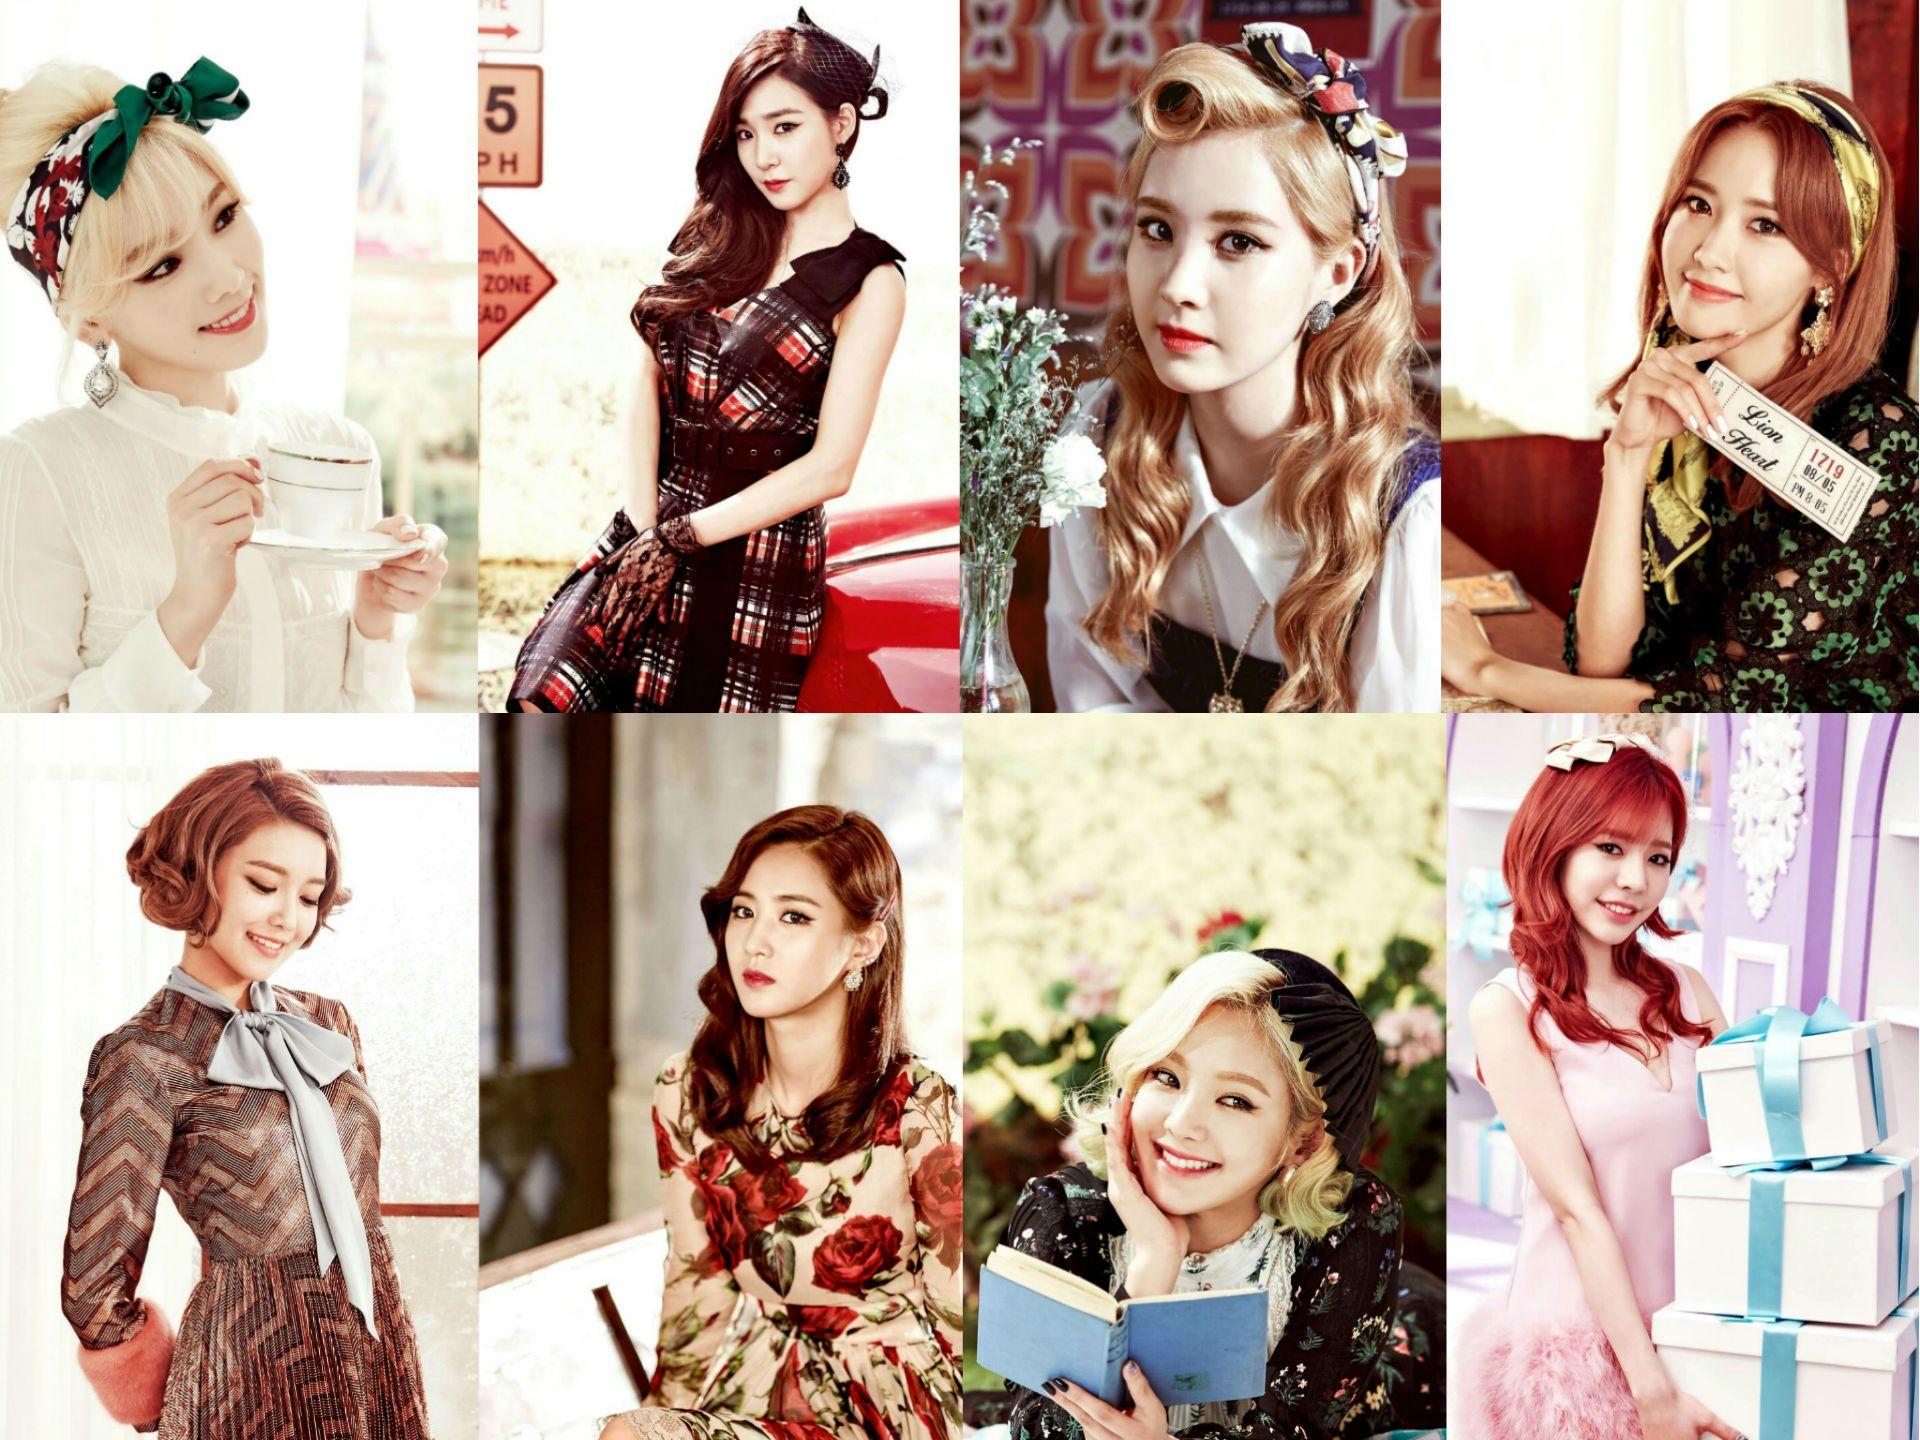 Taeyeon Sweet Wallpaper Snsd Colorful Lionheart1920 Snsd Wallpaper Snsd Girls Generation Taeyeon